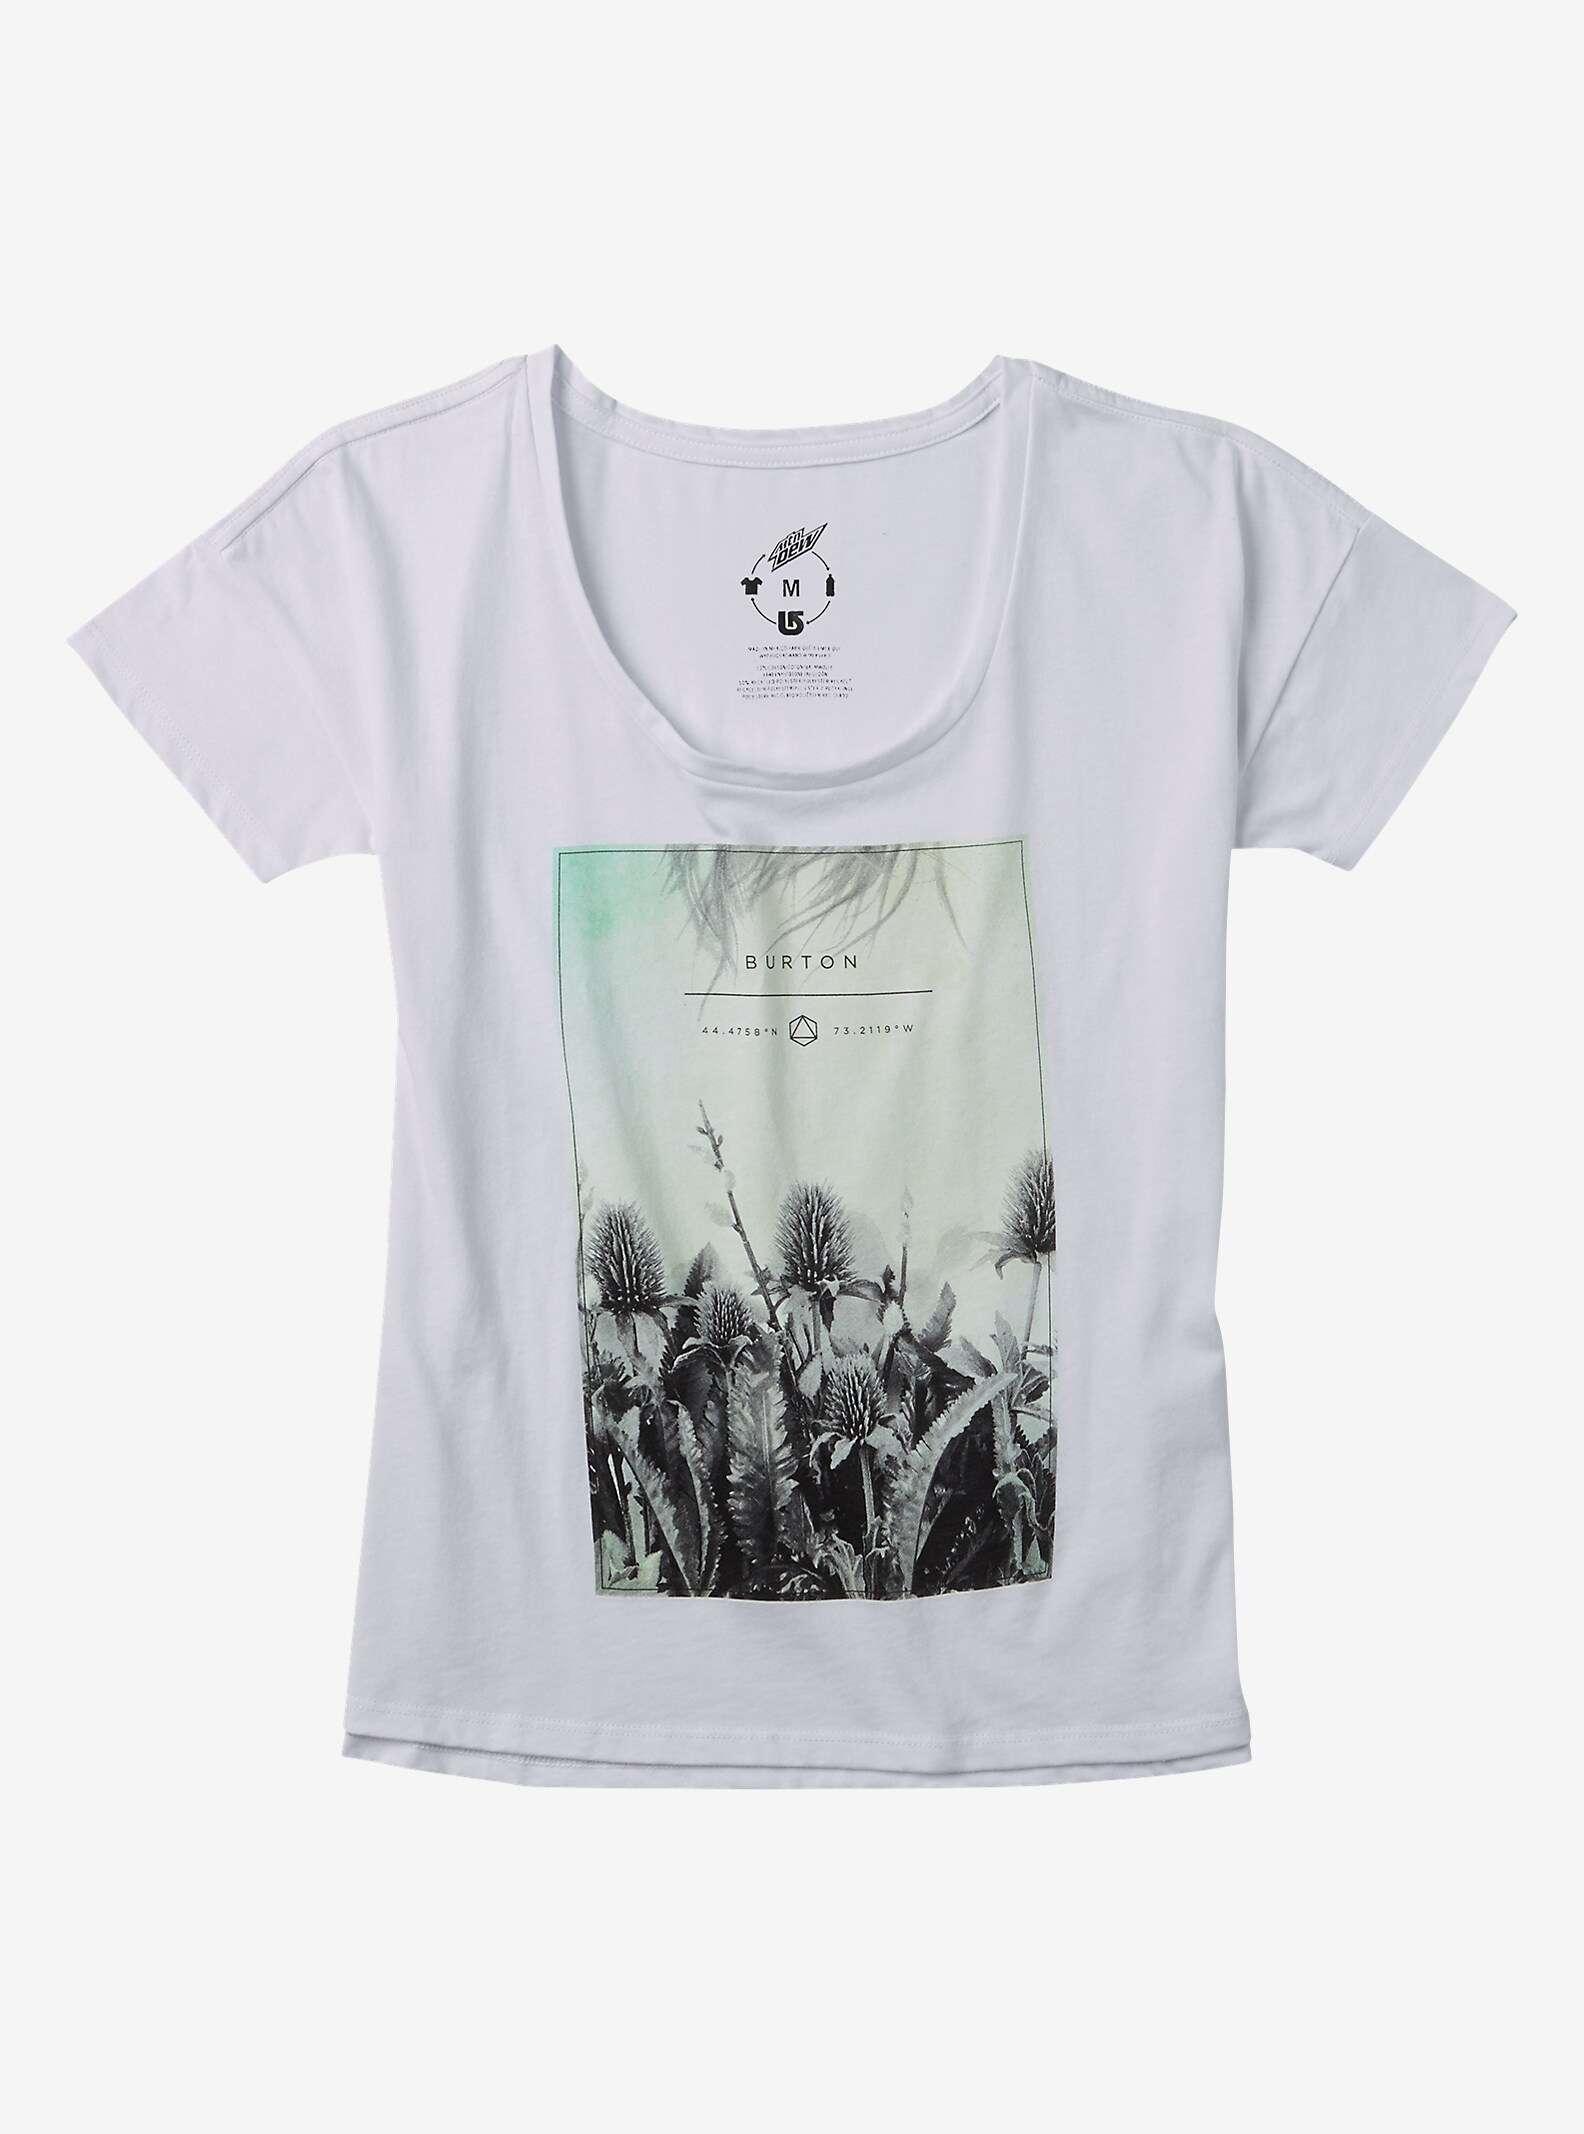 Burton Michelle T Shirt shown in Stout White